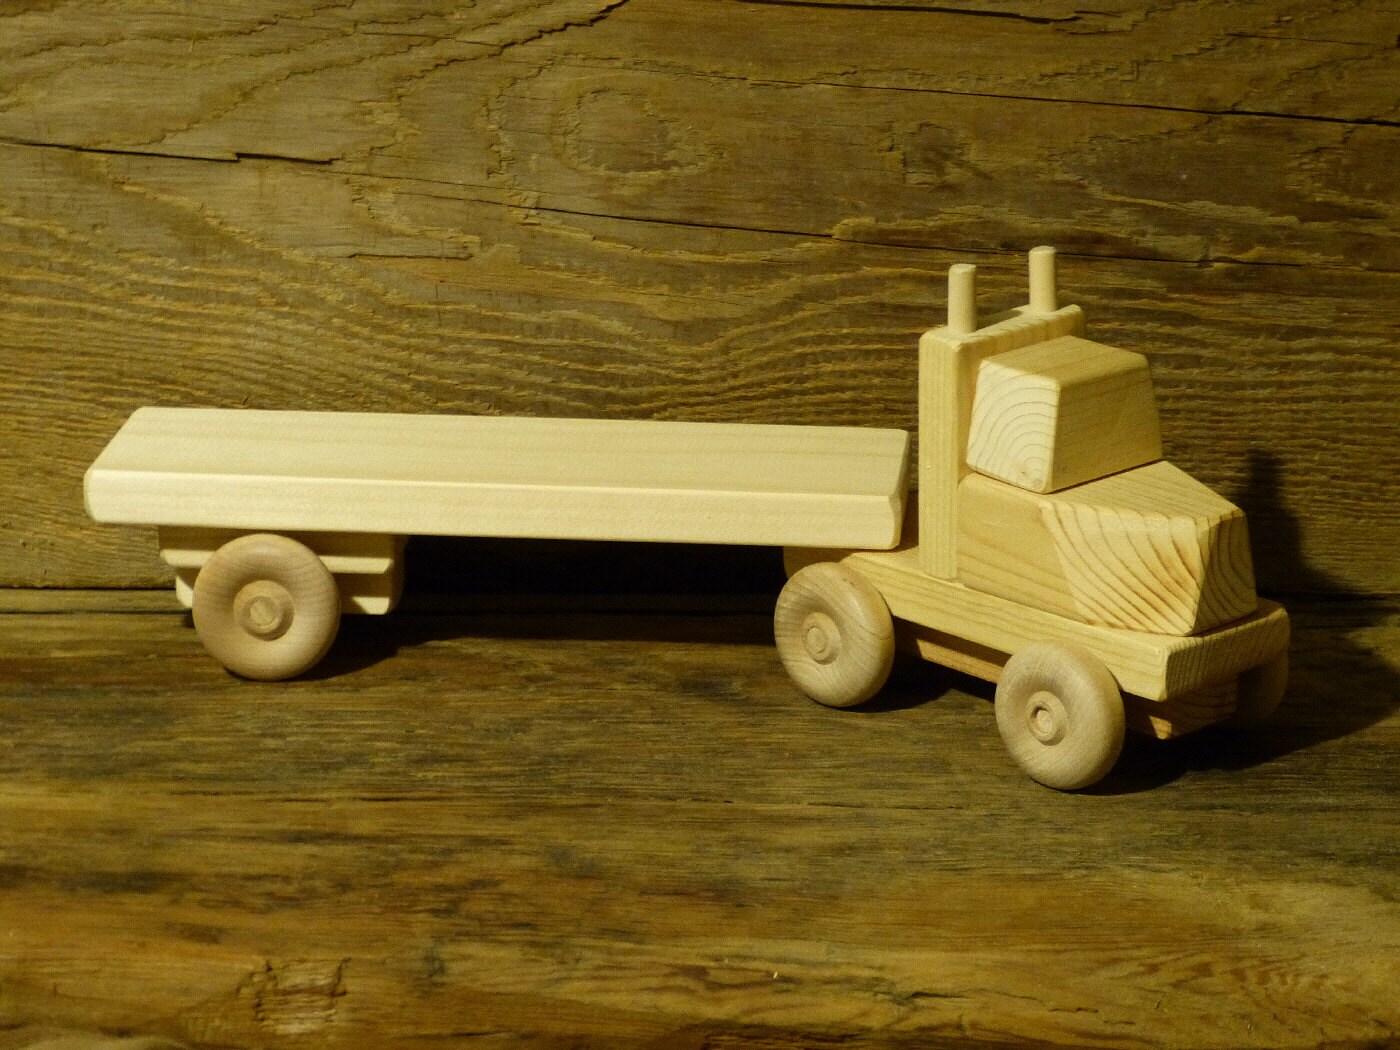 Handmade Wooden Toy Truck Flatbed Trailer Green Ecofriendly